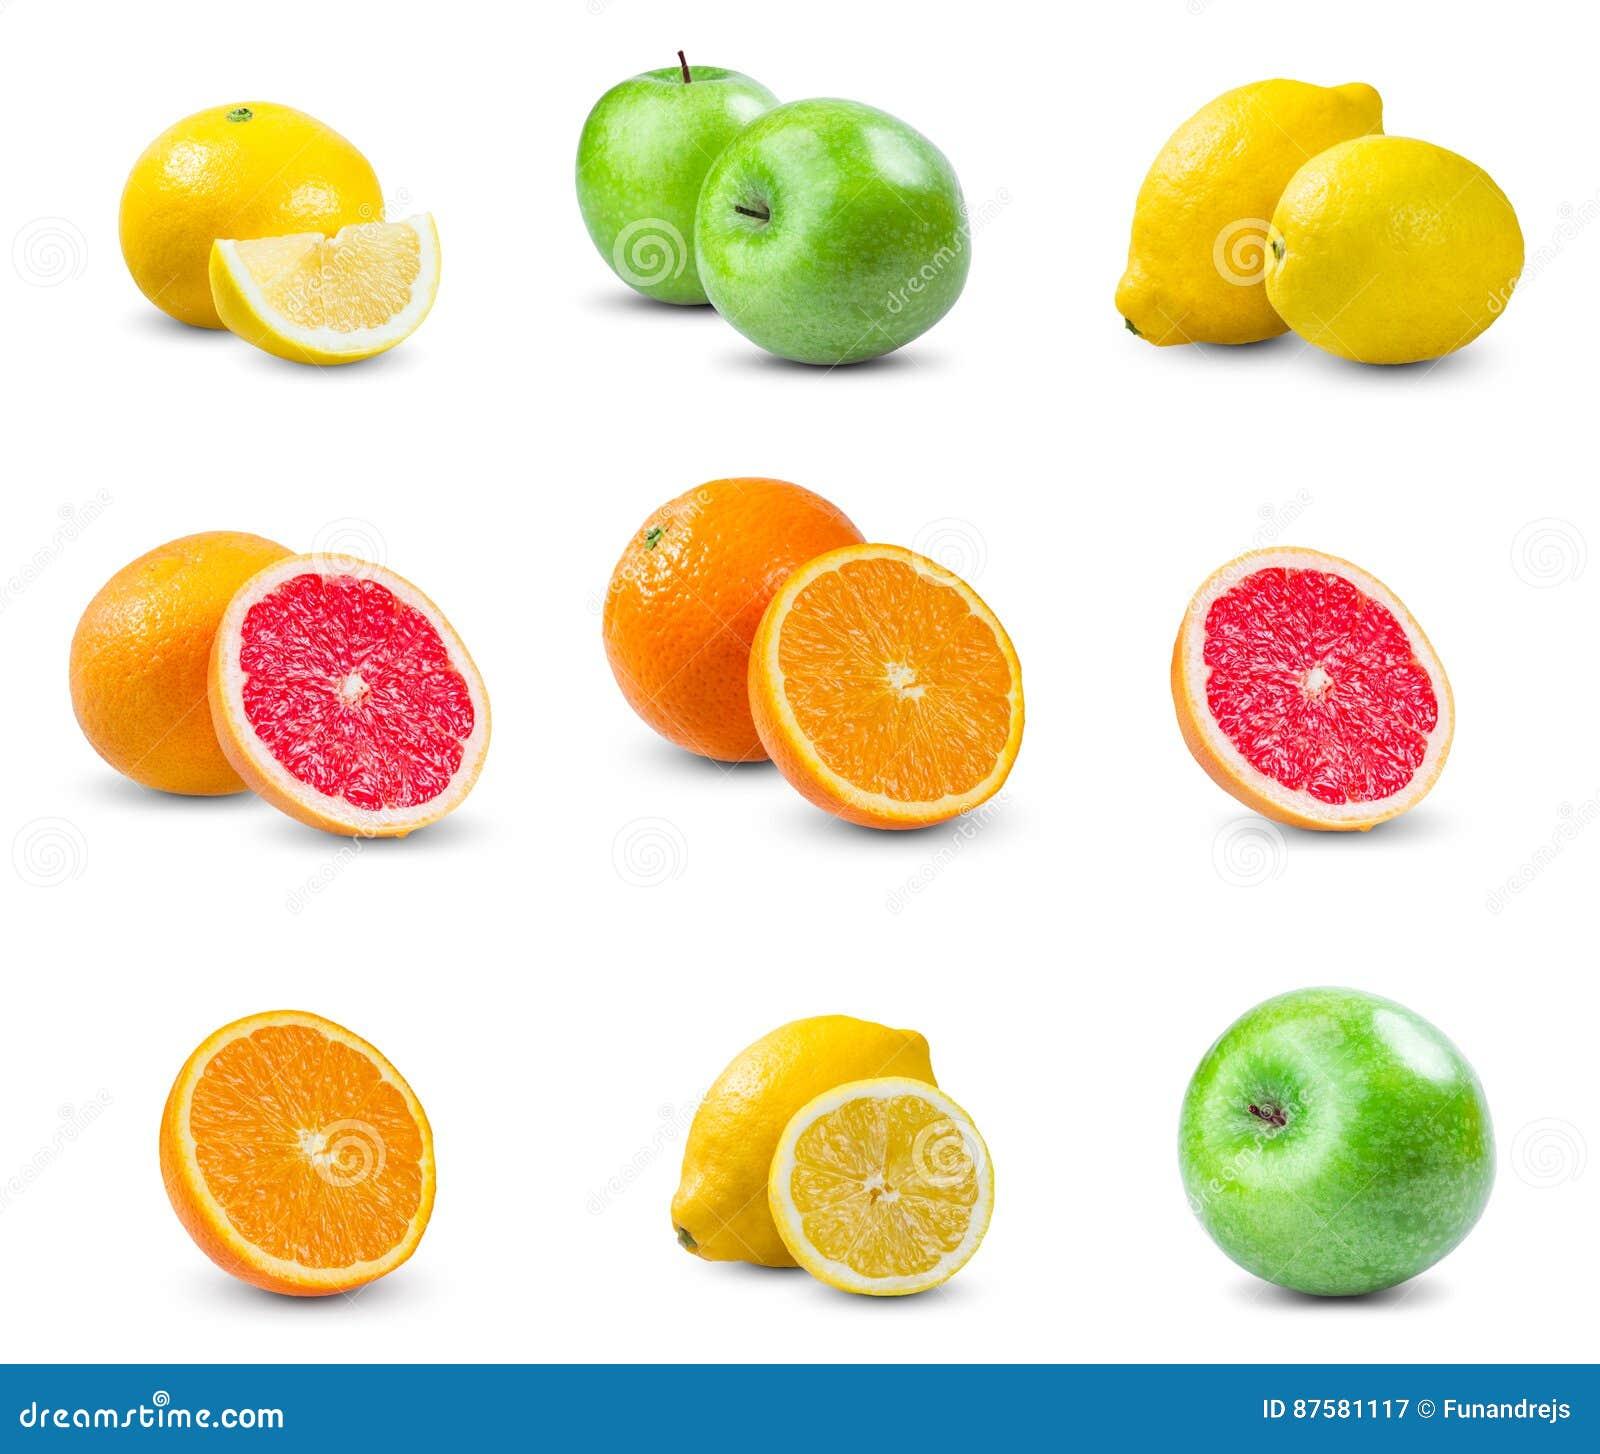 set of juicy fruits orange lemon grapefruit green apple rich